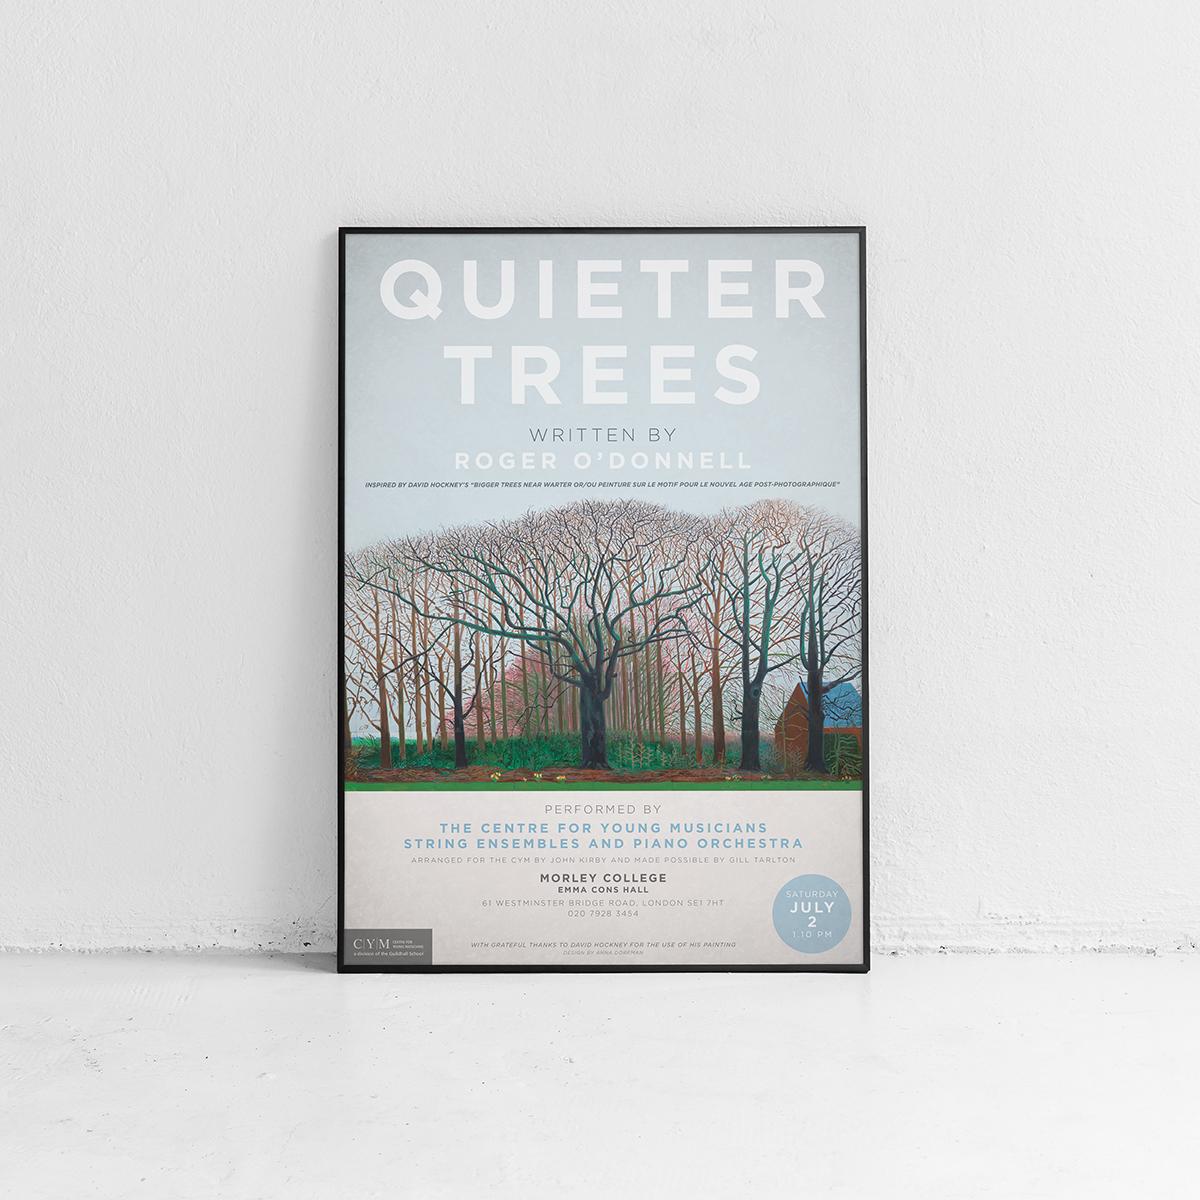 Quieter Trees - annadorfman.com